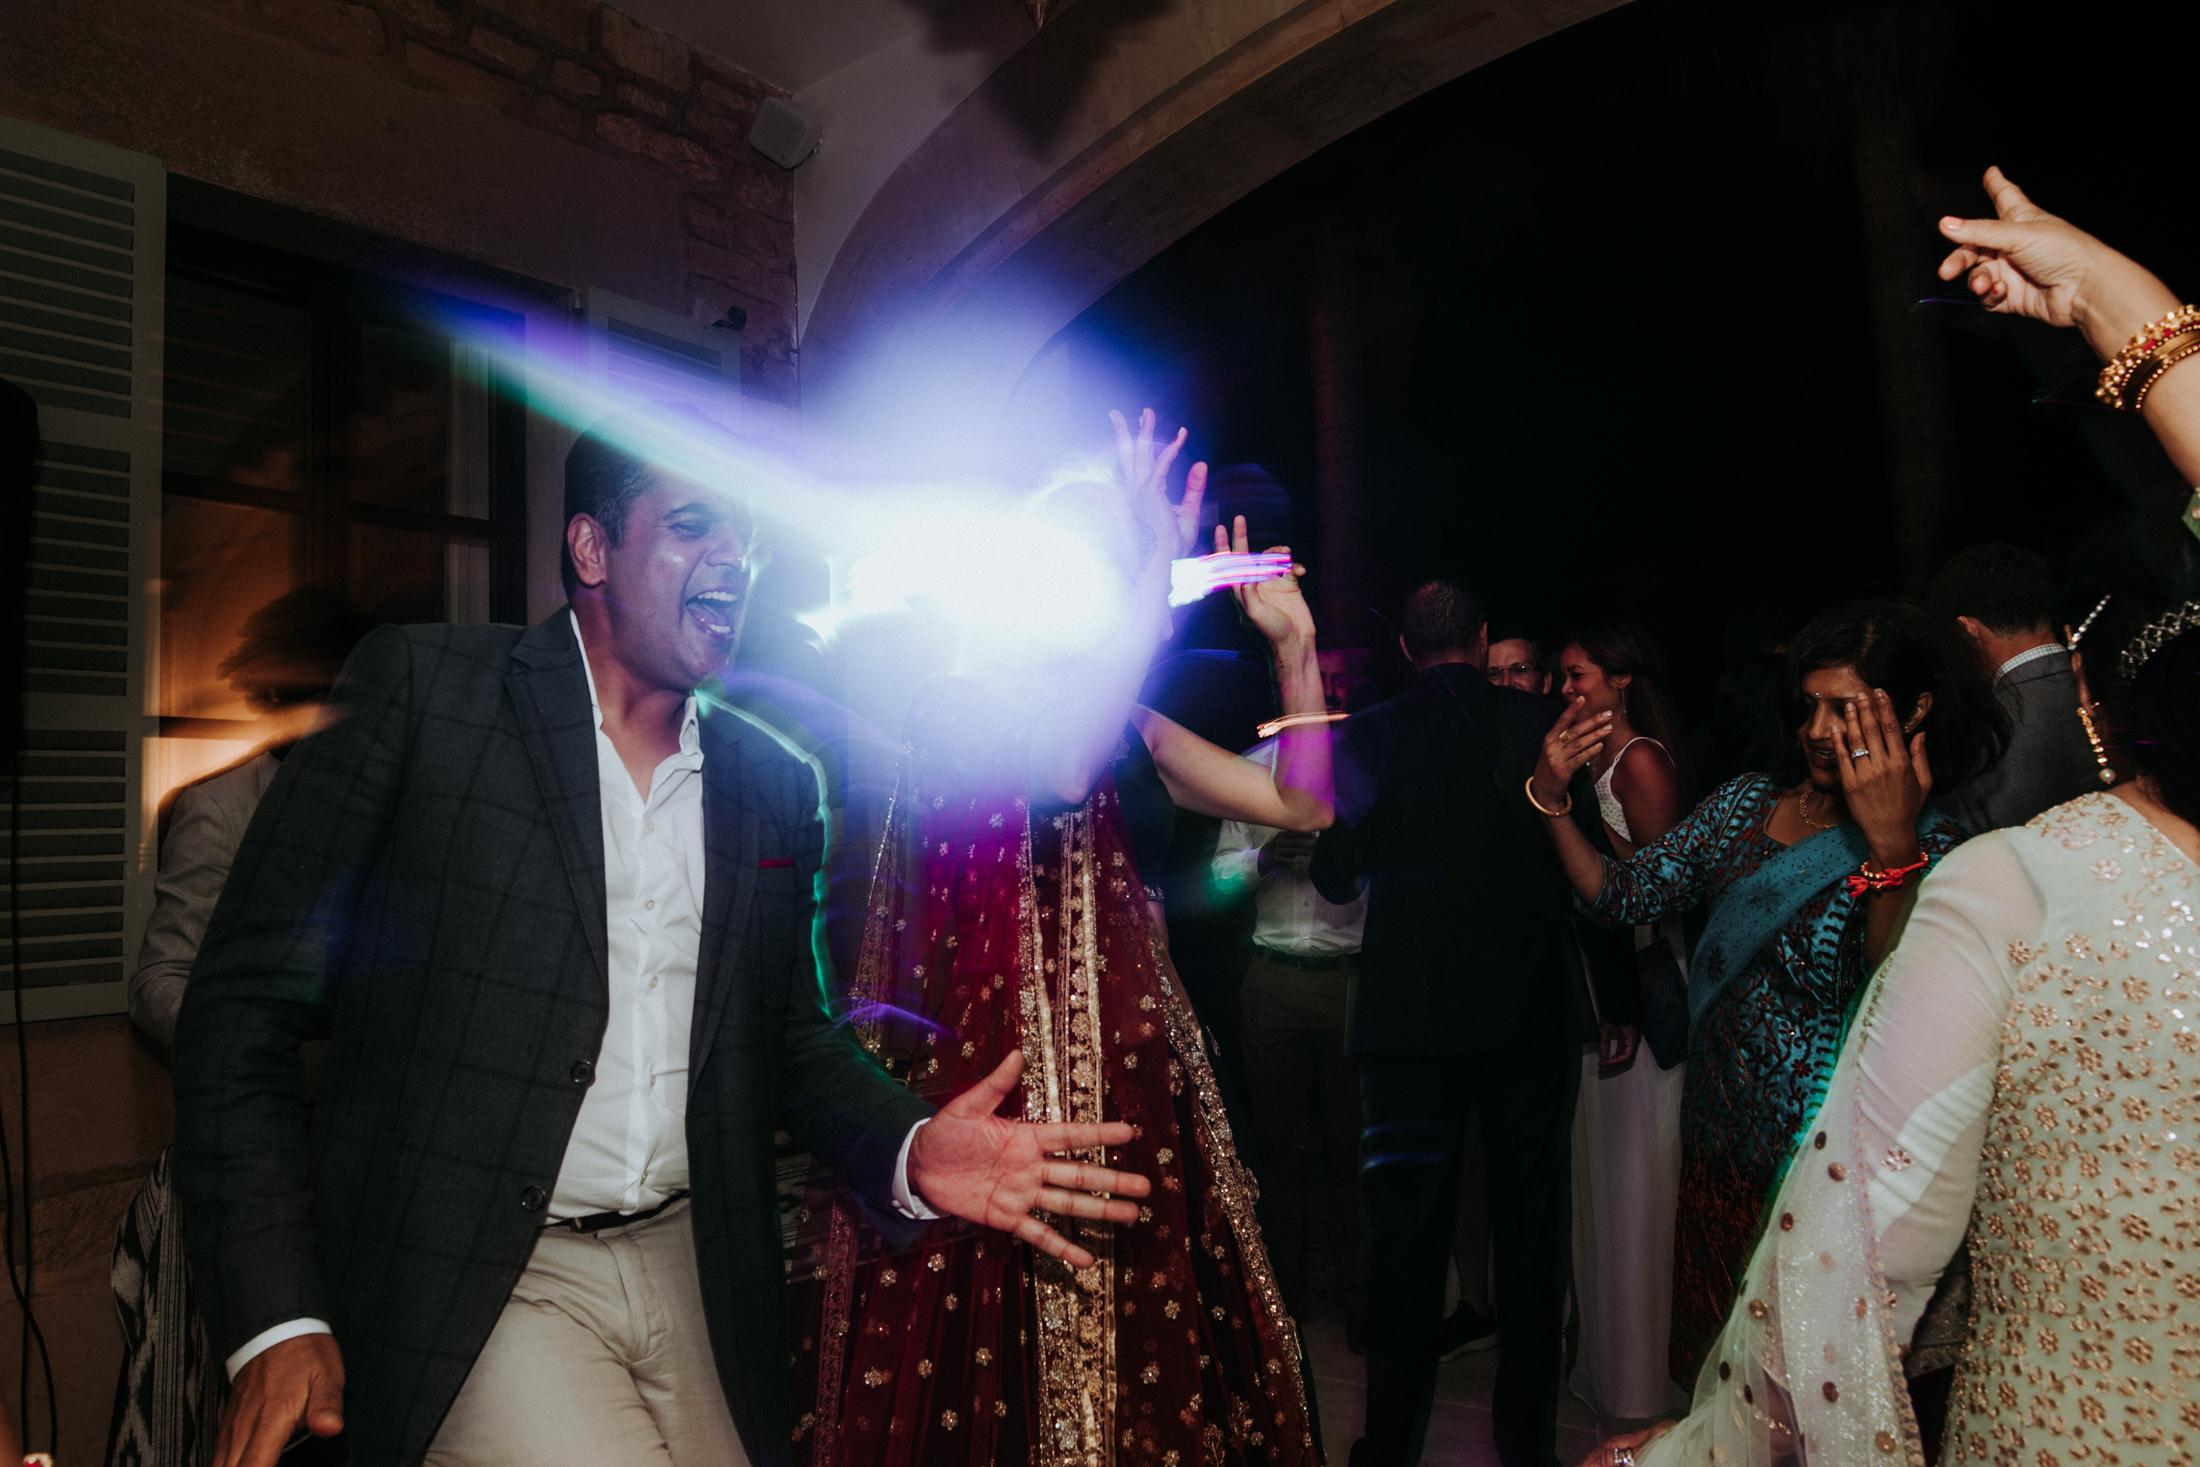 Wedding_Photographer_Mallorca_Daniela-Marquardt_Photography_New_York_Iceland_Tuscany_Santorini_Portugal_Austria_Bavaria_Elopement_Hochzeitsfotograf_AntjeRajat1_59